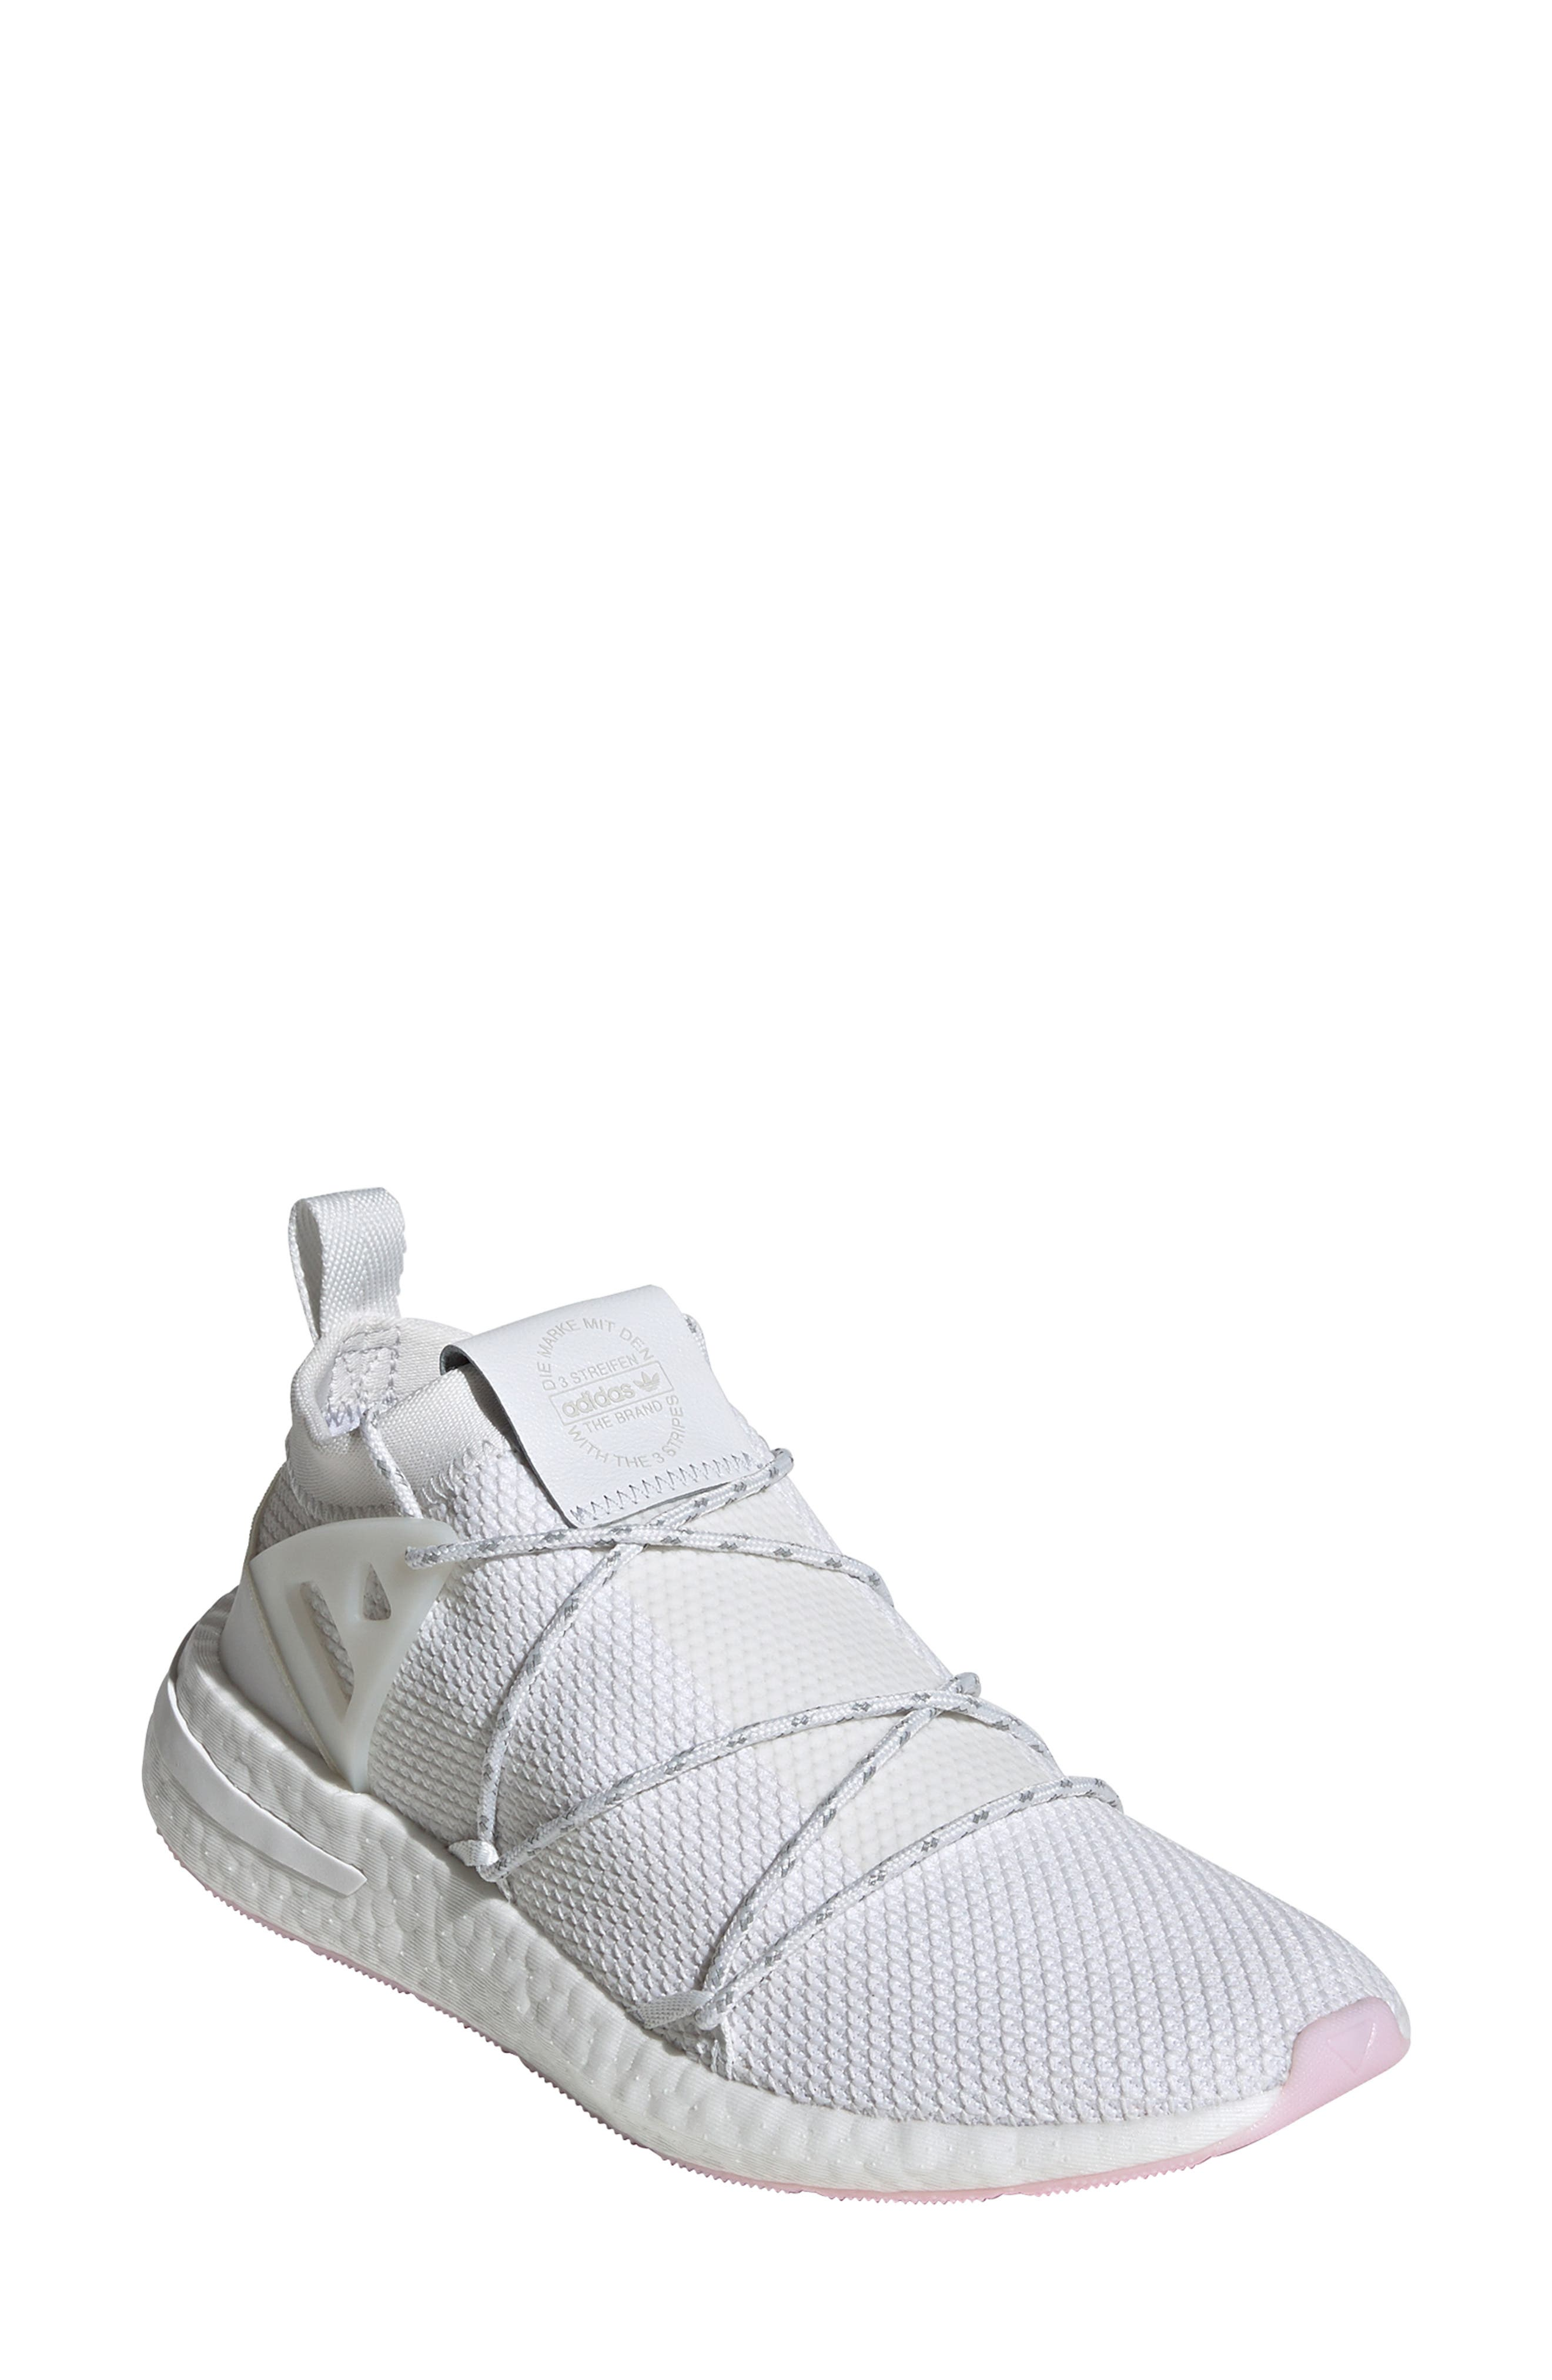 Adidas Arkyn Sneaker, White